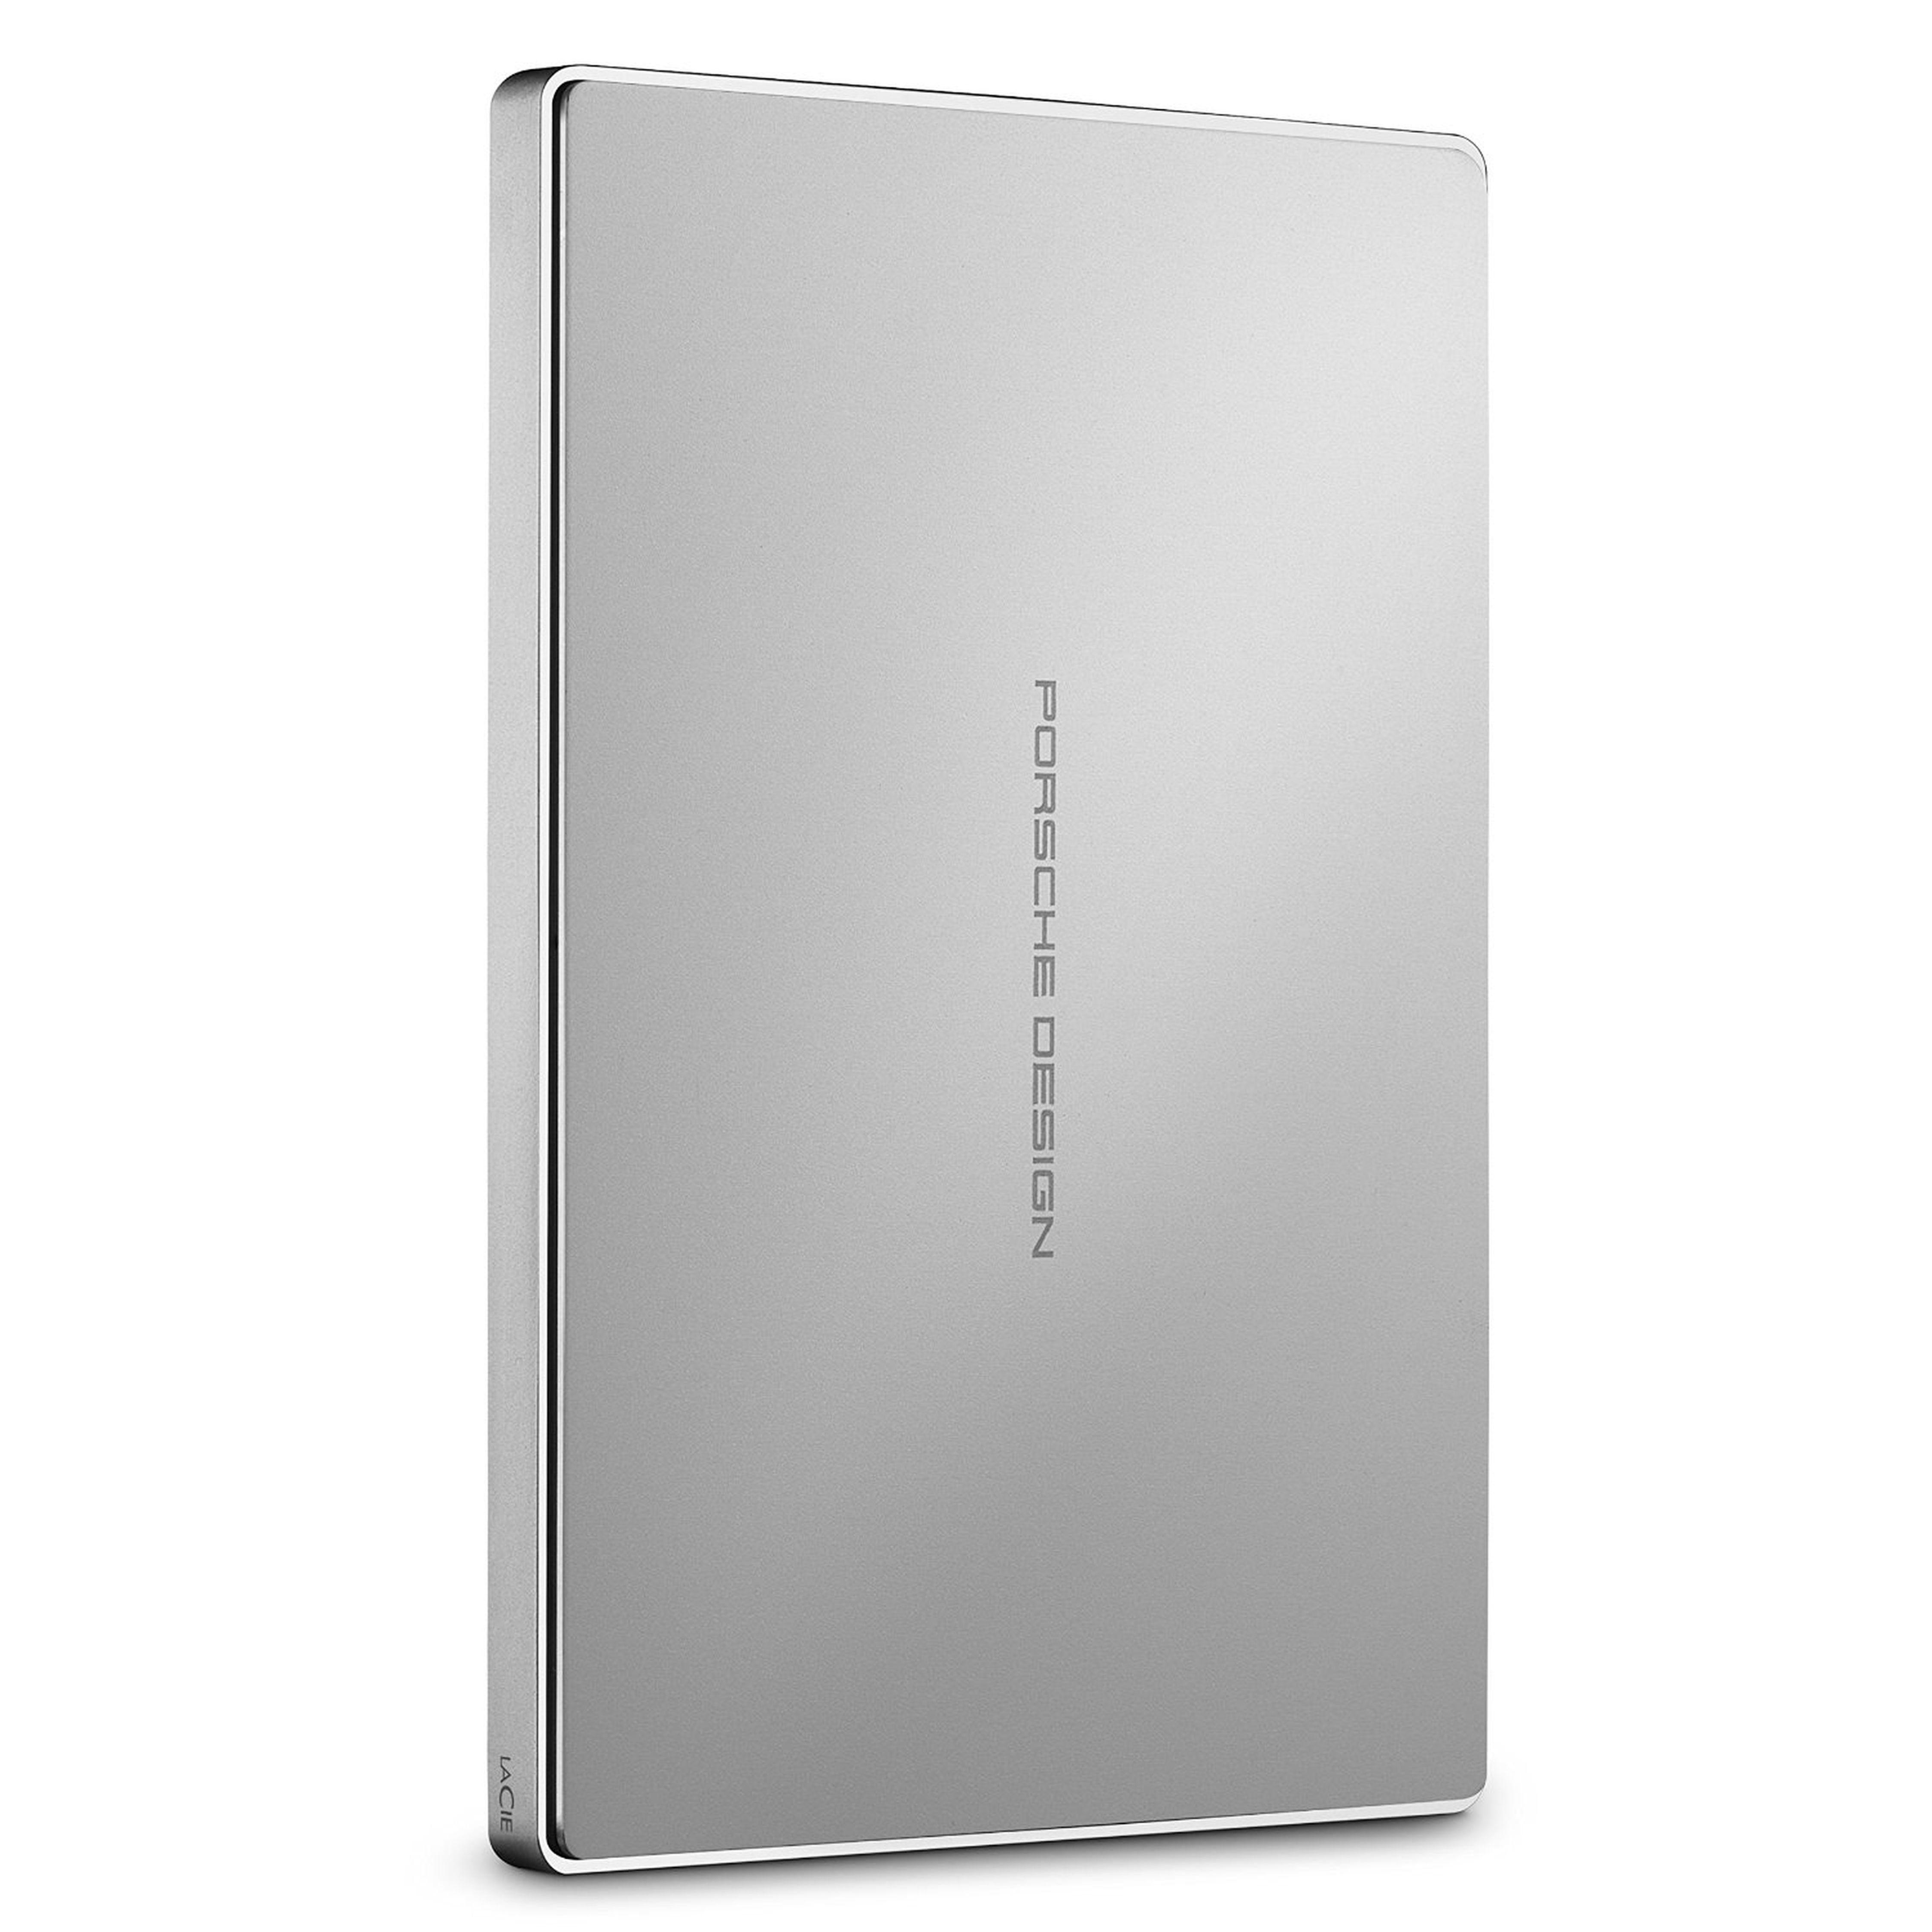 LACIE Porsche Design externe Festplatte »STFD2000400 2 TB«